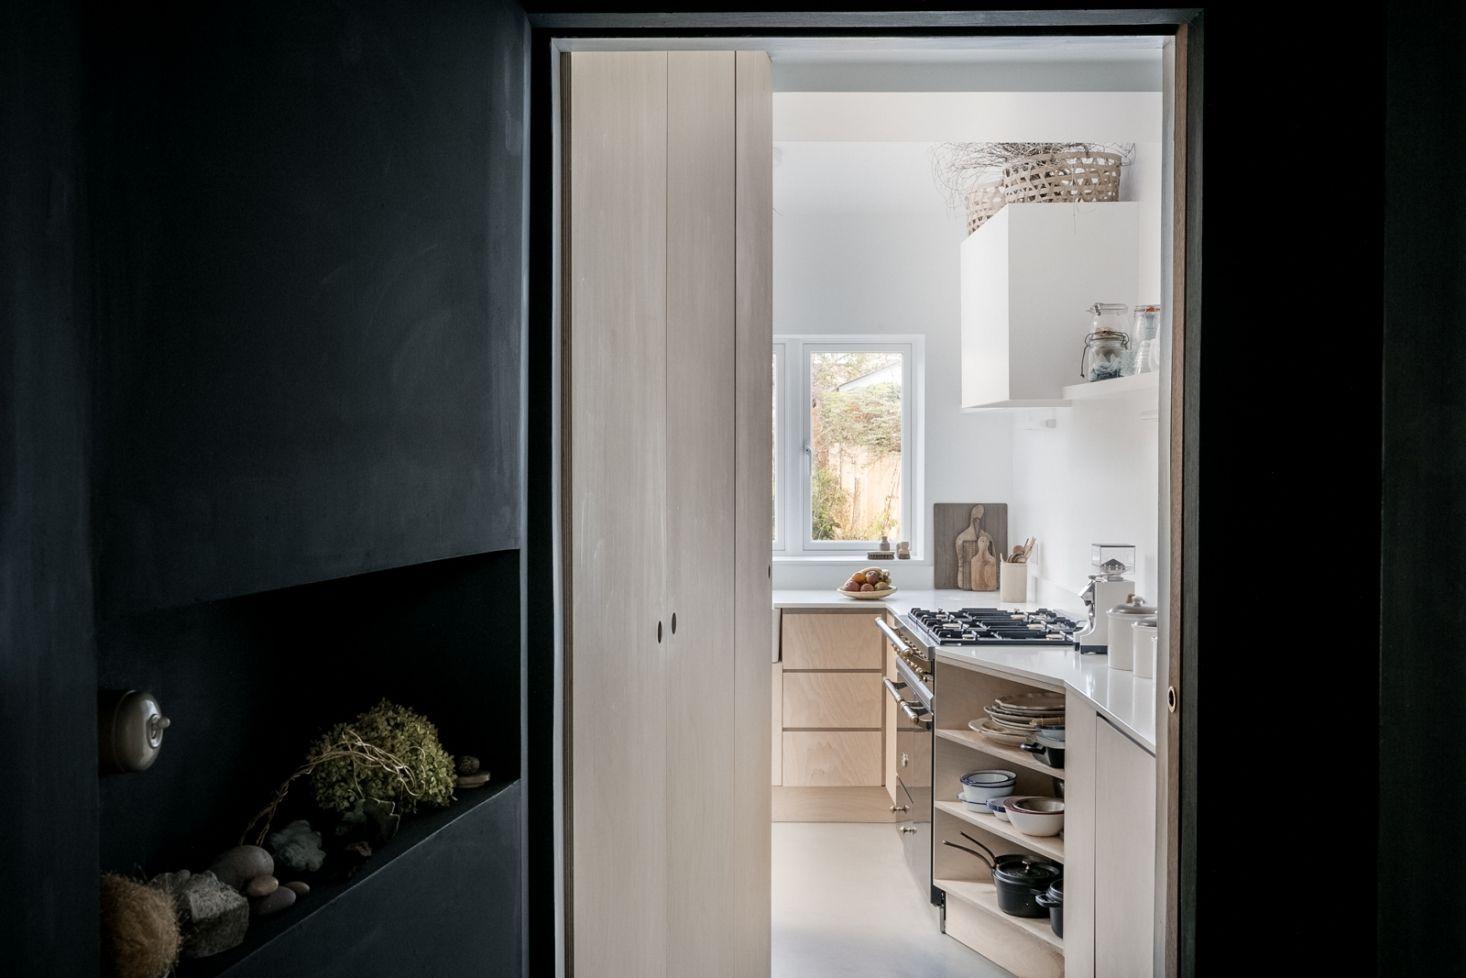 The botanical life at home with london stylist yasuyo harvey kitchen sinkshouse beautifulmodern